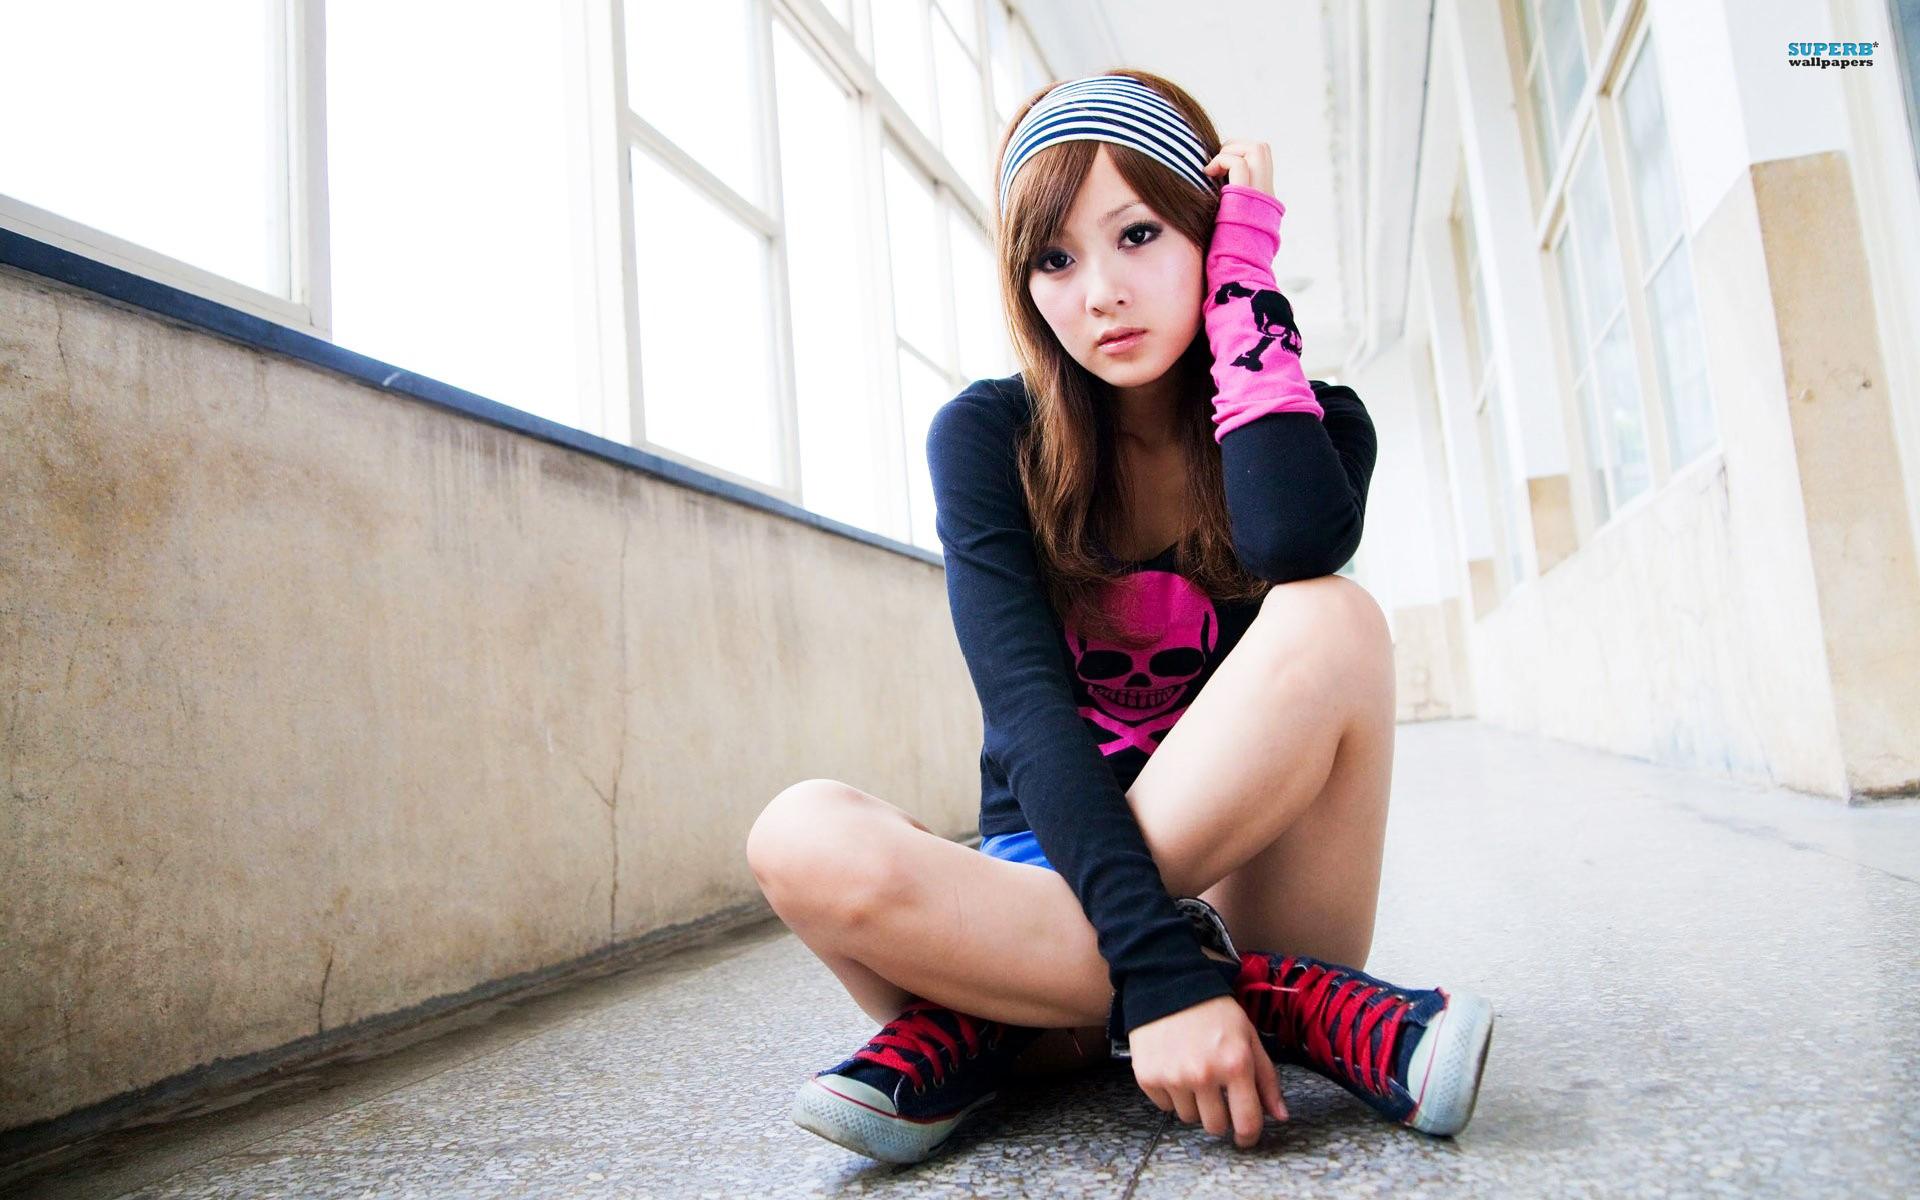 Mikako Zhang - Beautiful Girls Of Sad , HD Wallpaper & Backgrounds